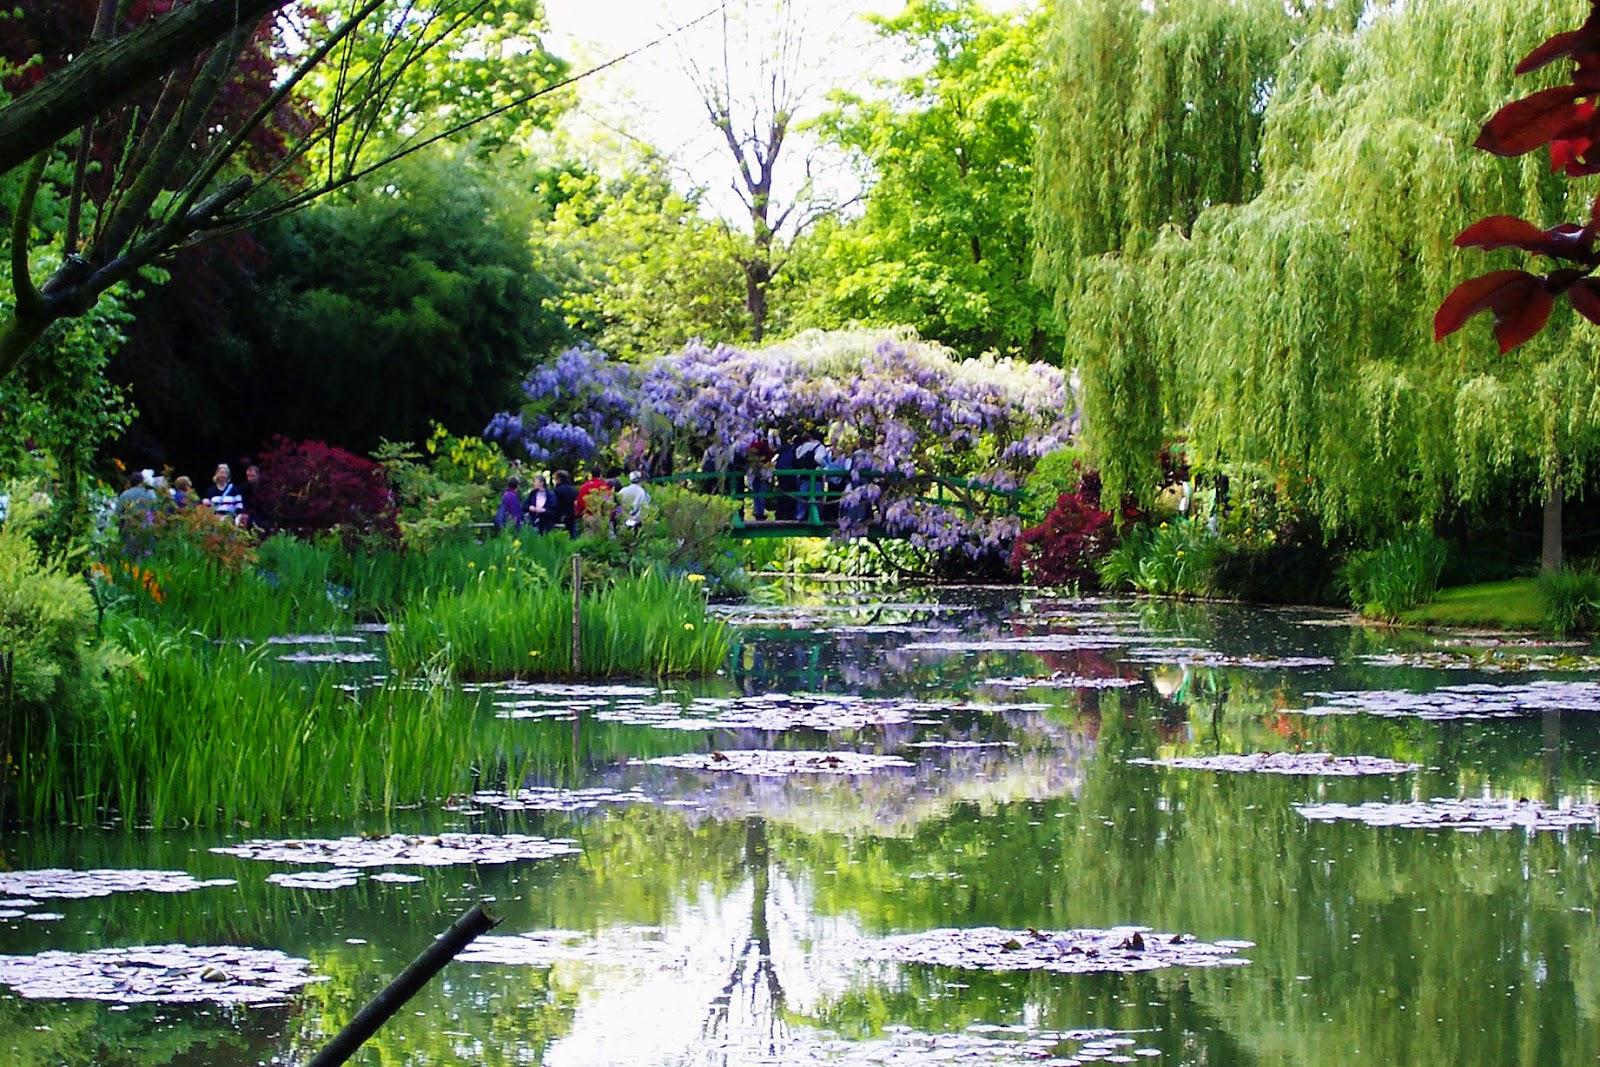 Water Gardens: E-arthistory: MONET's GIVERNY